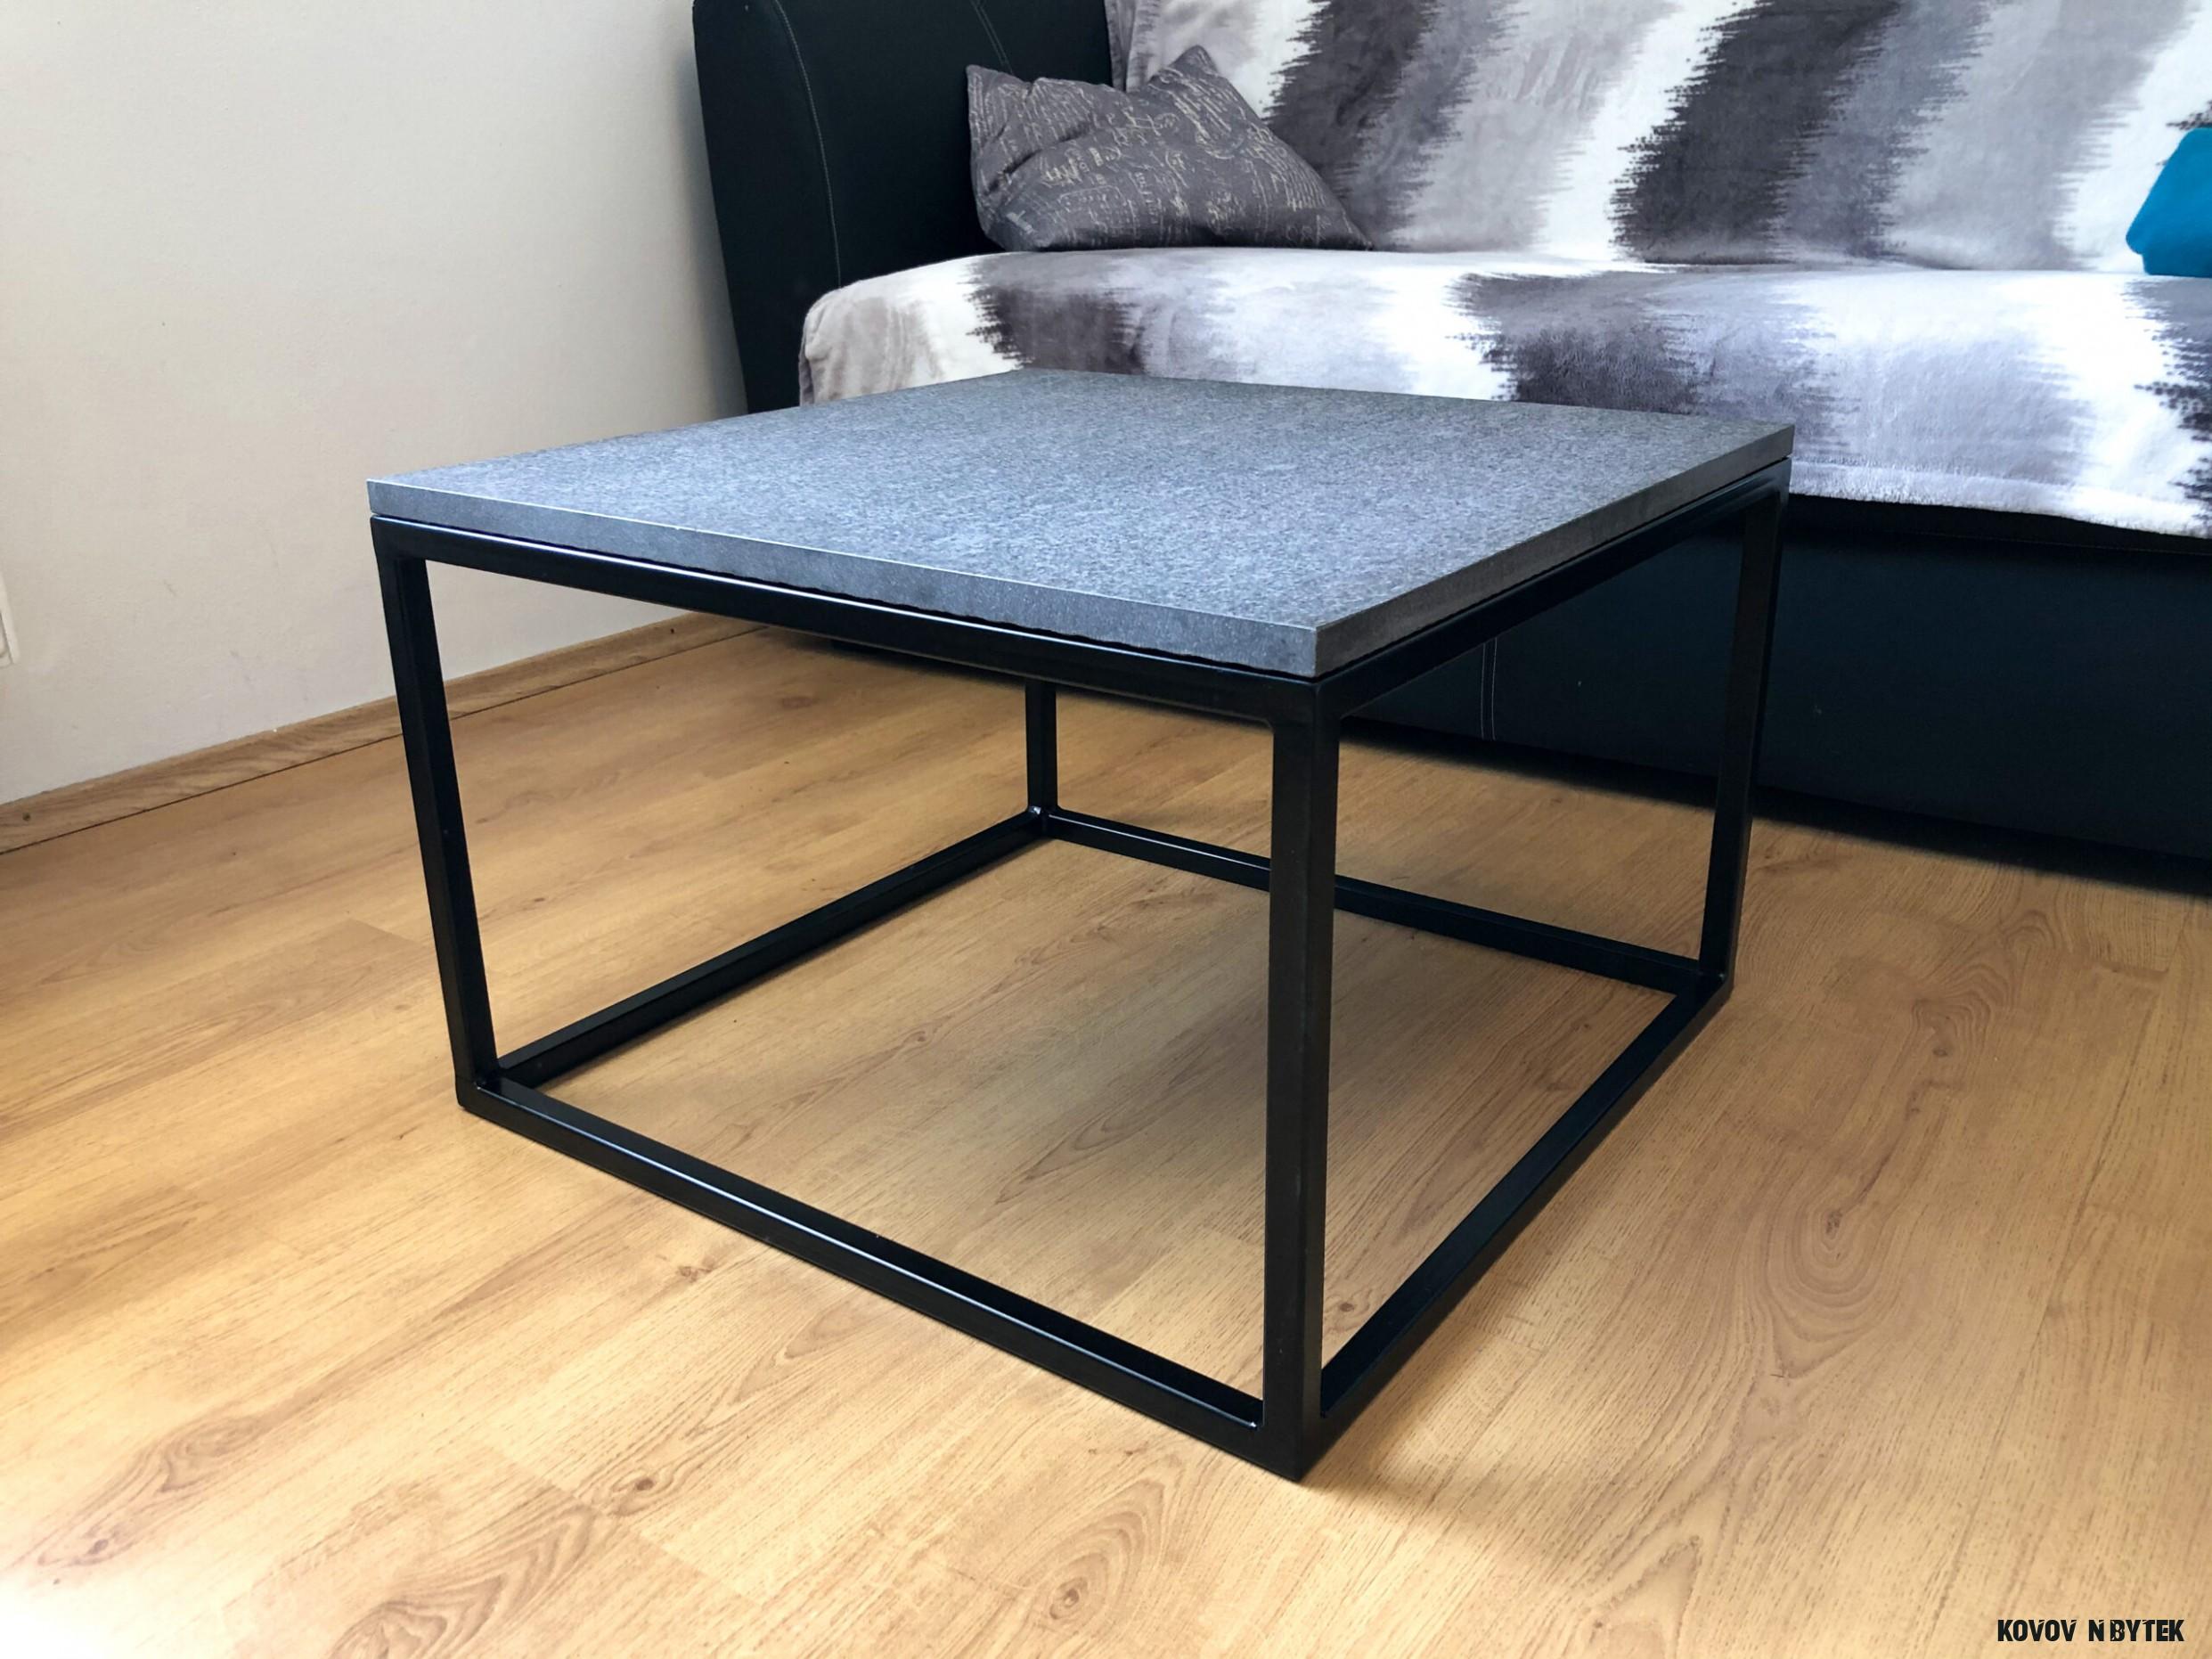 Kovový nábytek - Hardsteel